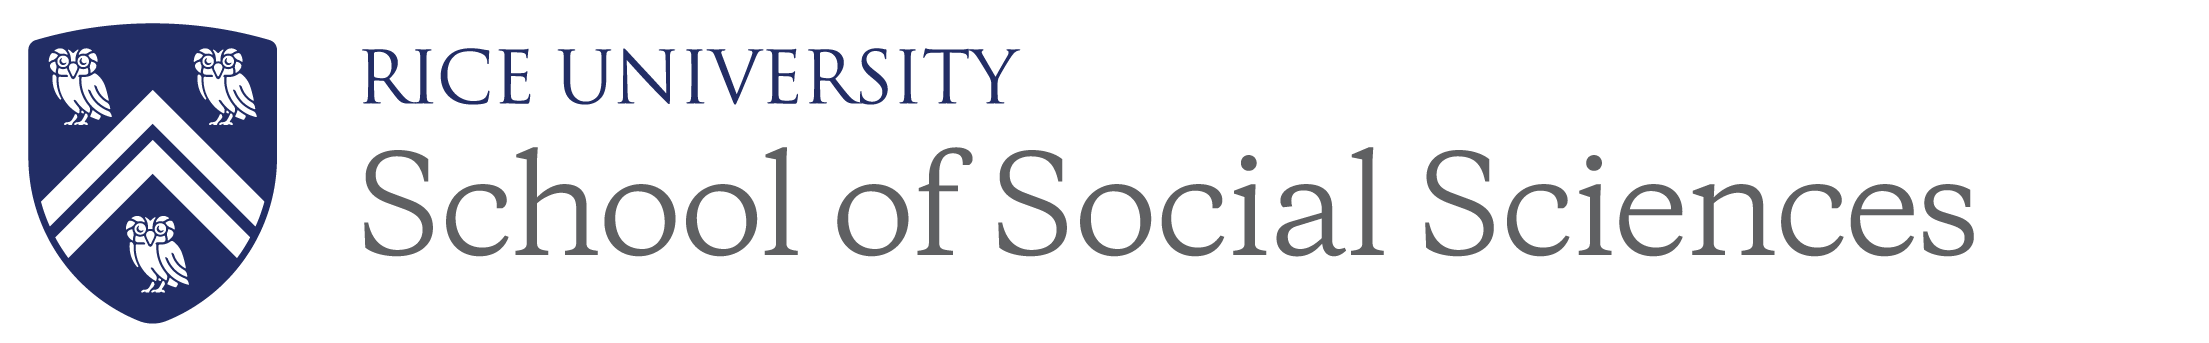 Rice University School of Social Sciences